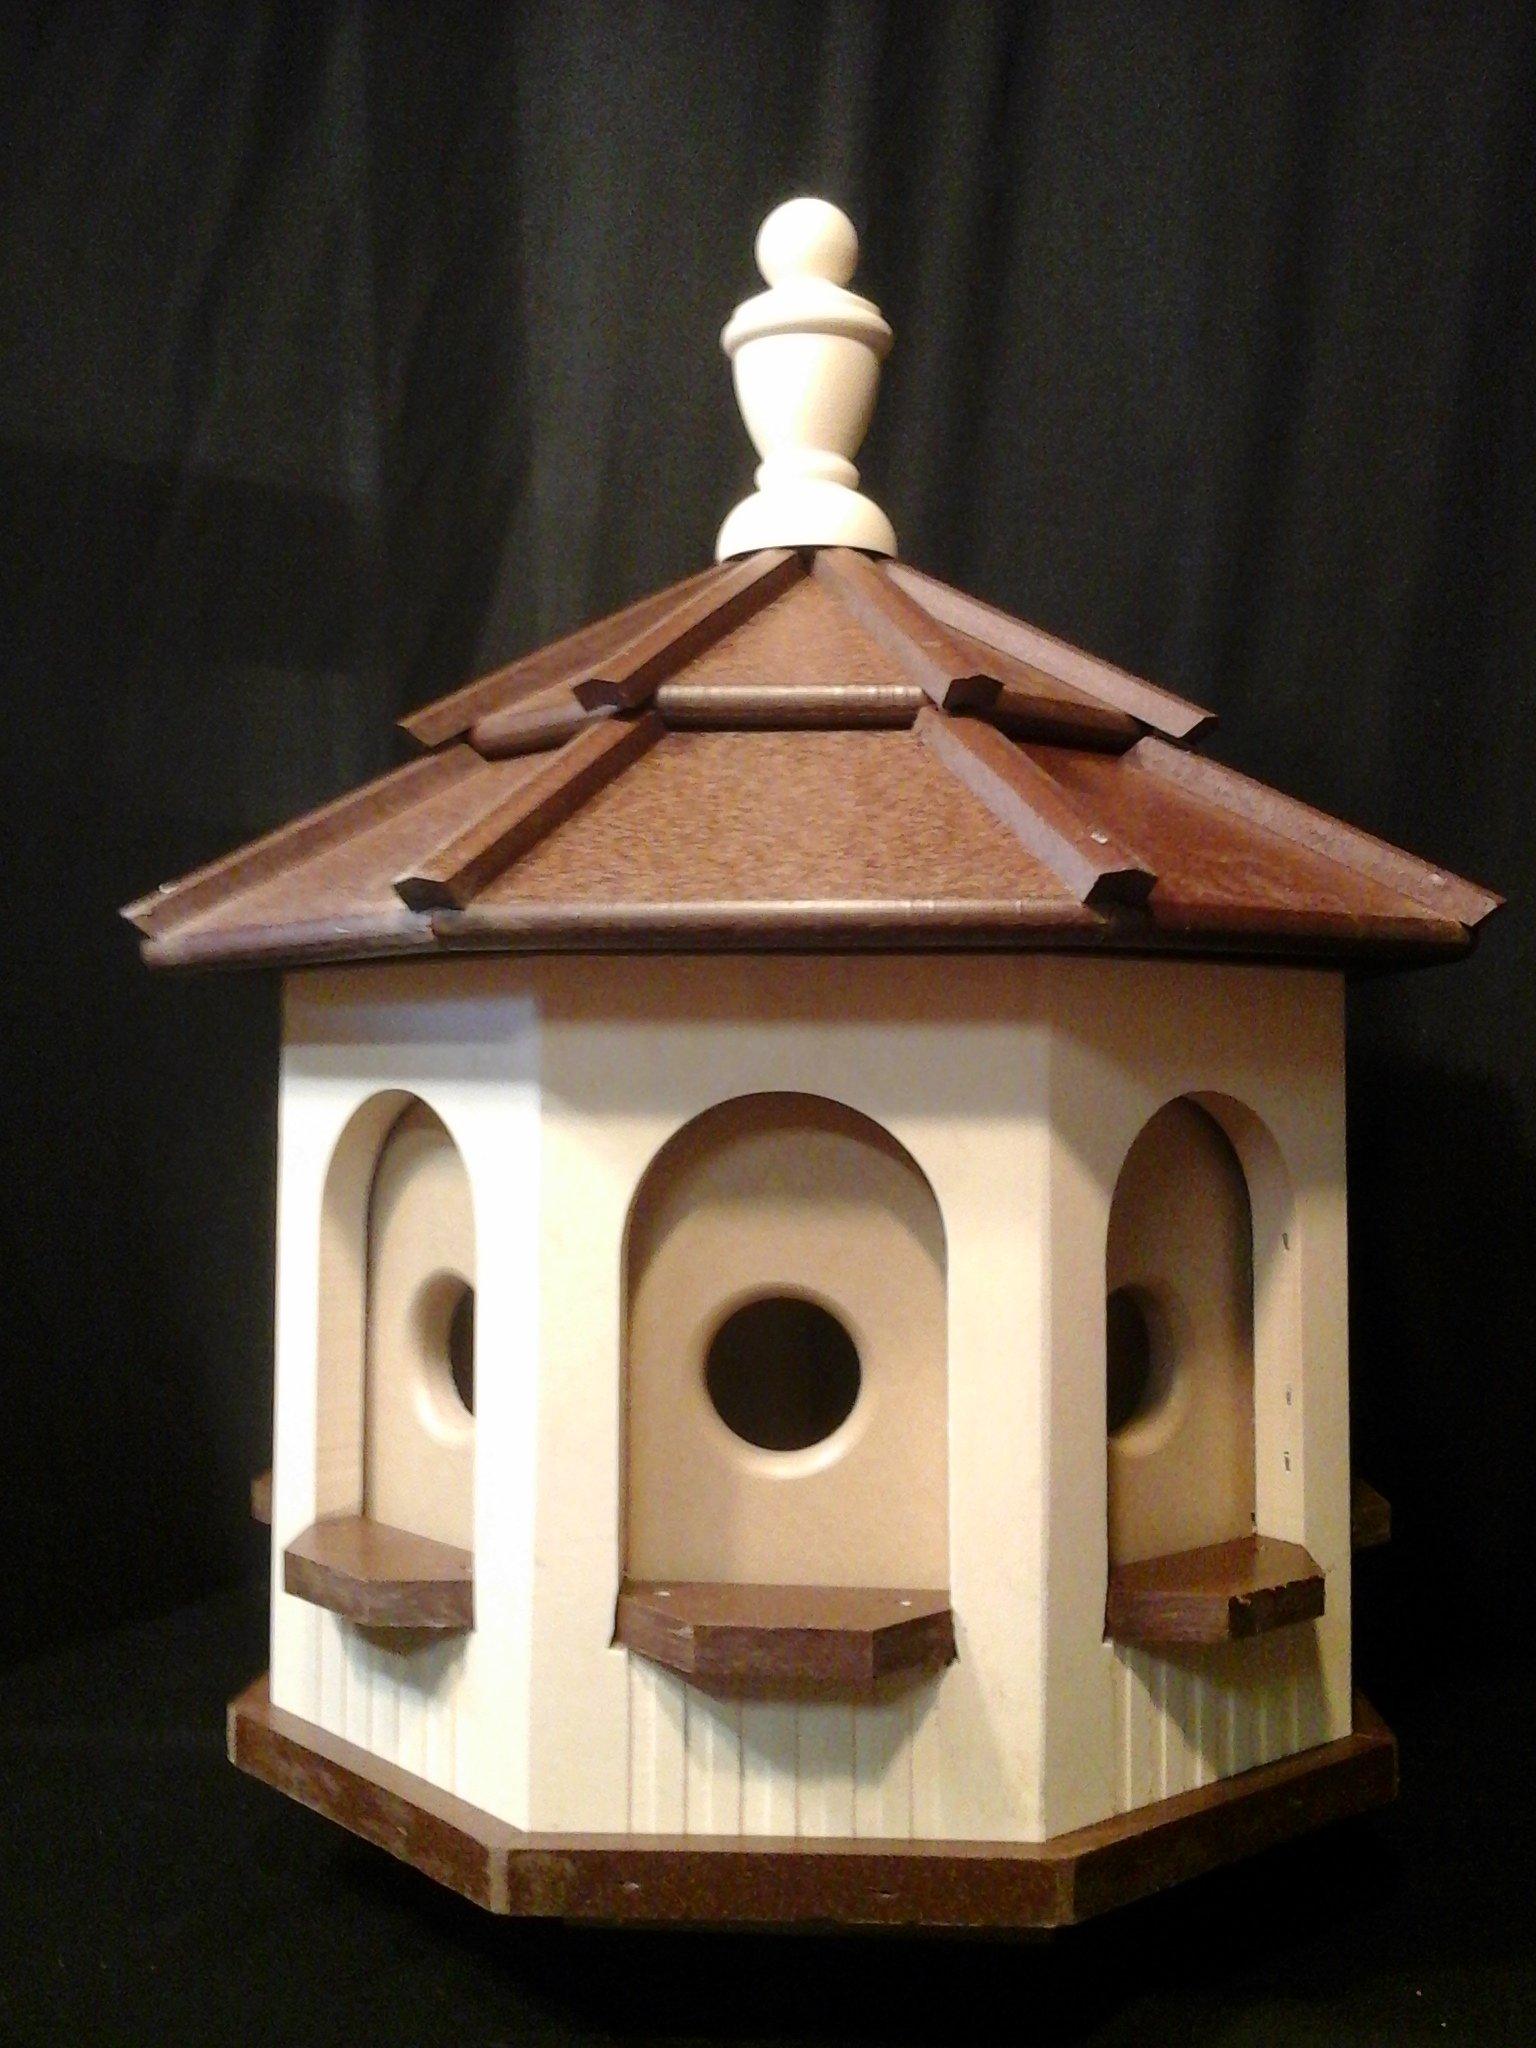 Amish Handcrafted Poly Octagon Gazebo Birdhouse Homemade Handmade Ivory & Brown